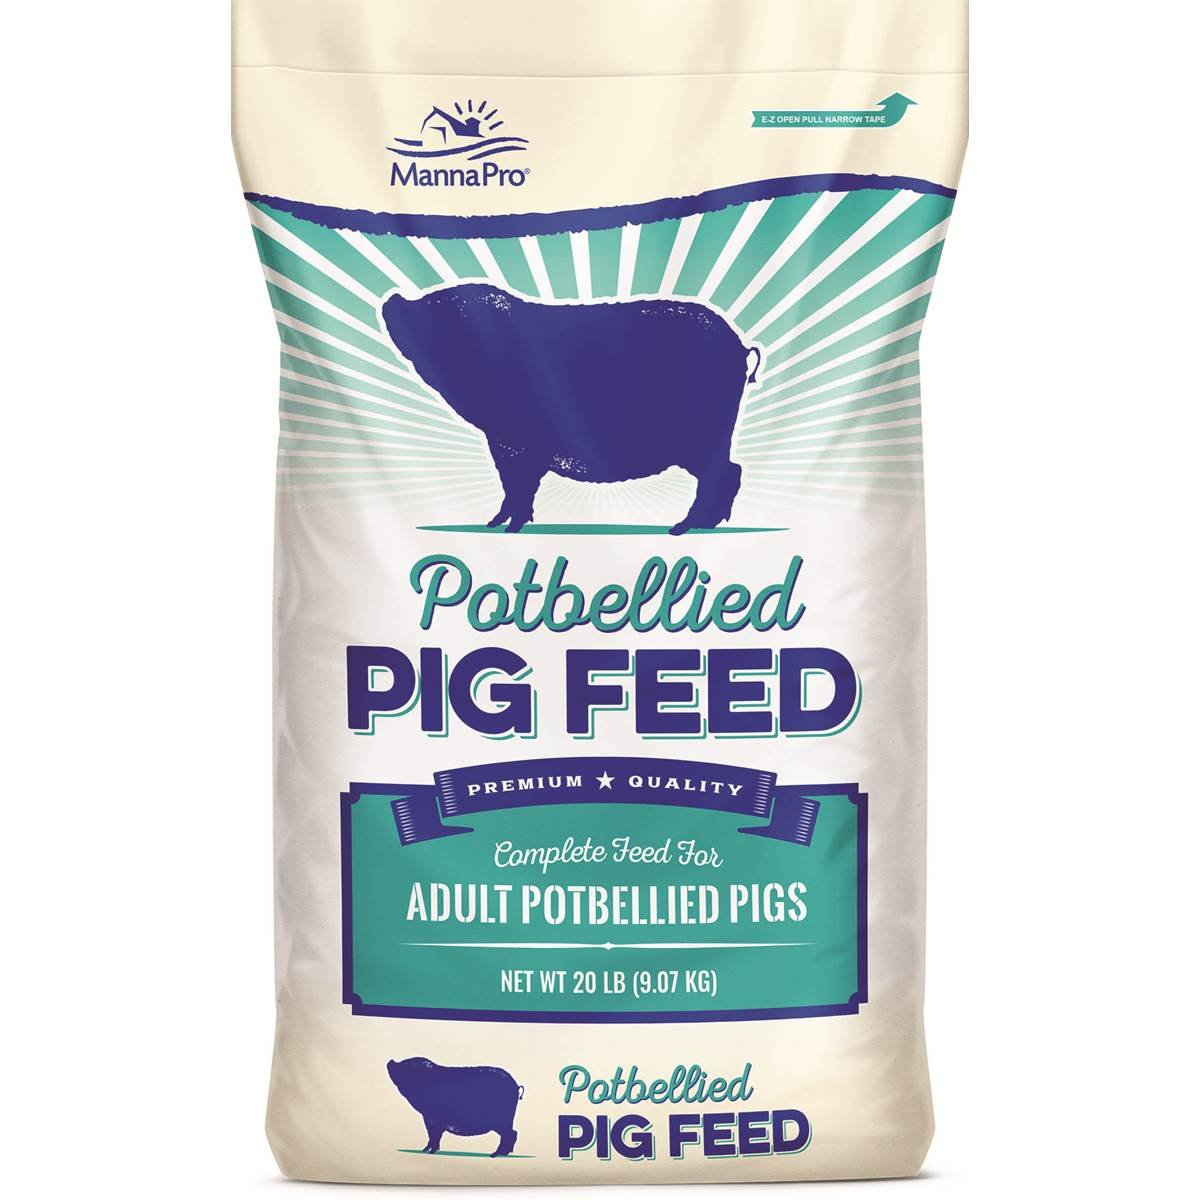 Manna Pro Potbellied Pig Food, 20 Lb by Manna Pro